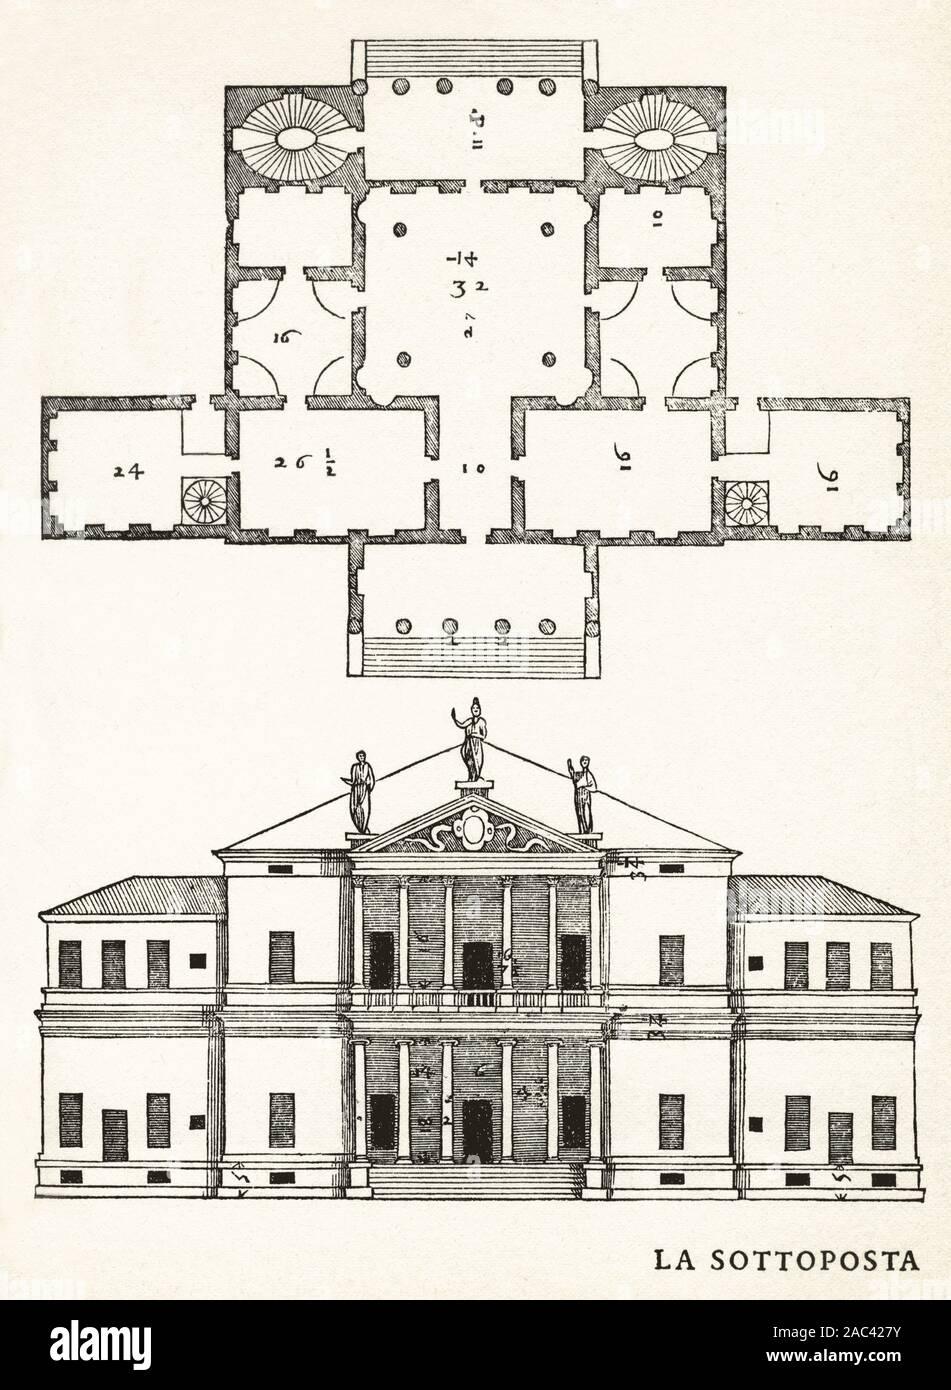 Andrea Palladio Villa La Sottoposta Facade Elevation Drawing Woodcut Print From The Four Books Of Architecture 1570 Italian Renaissance Stock Photo Alamy